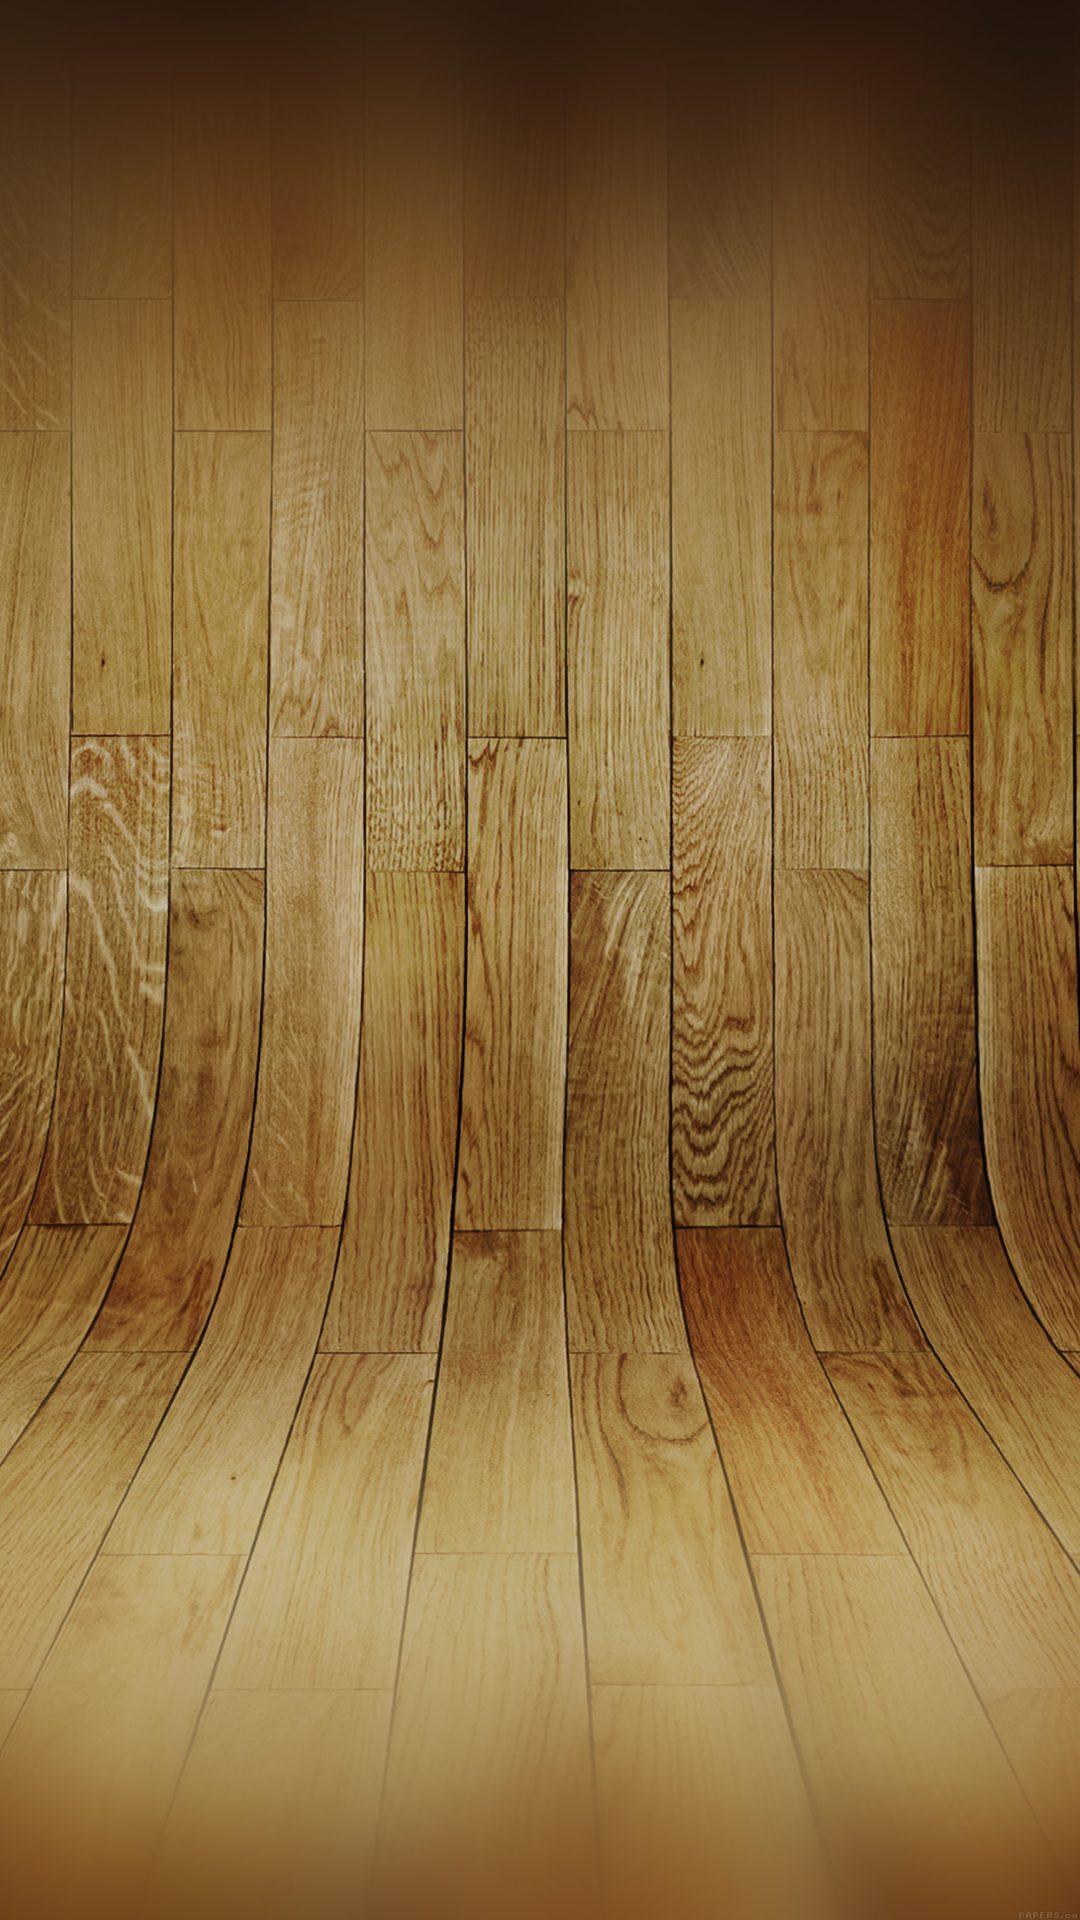 Wood Texture Nature Pattern